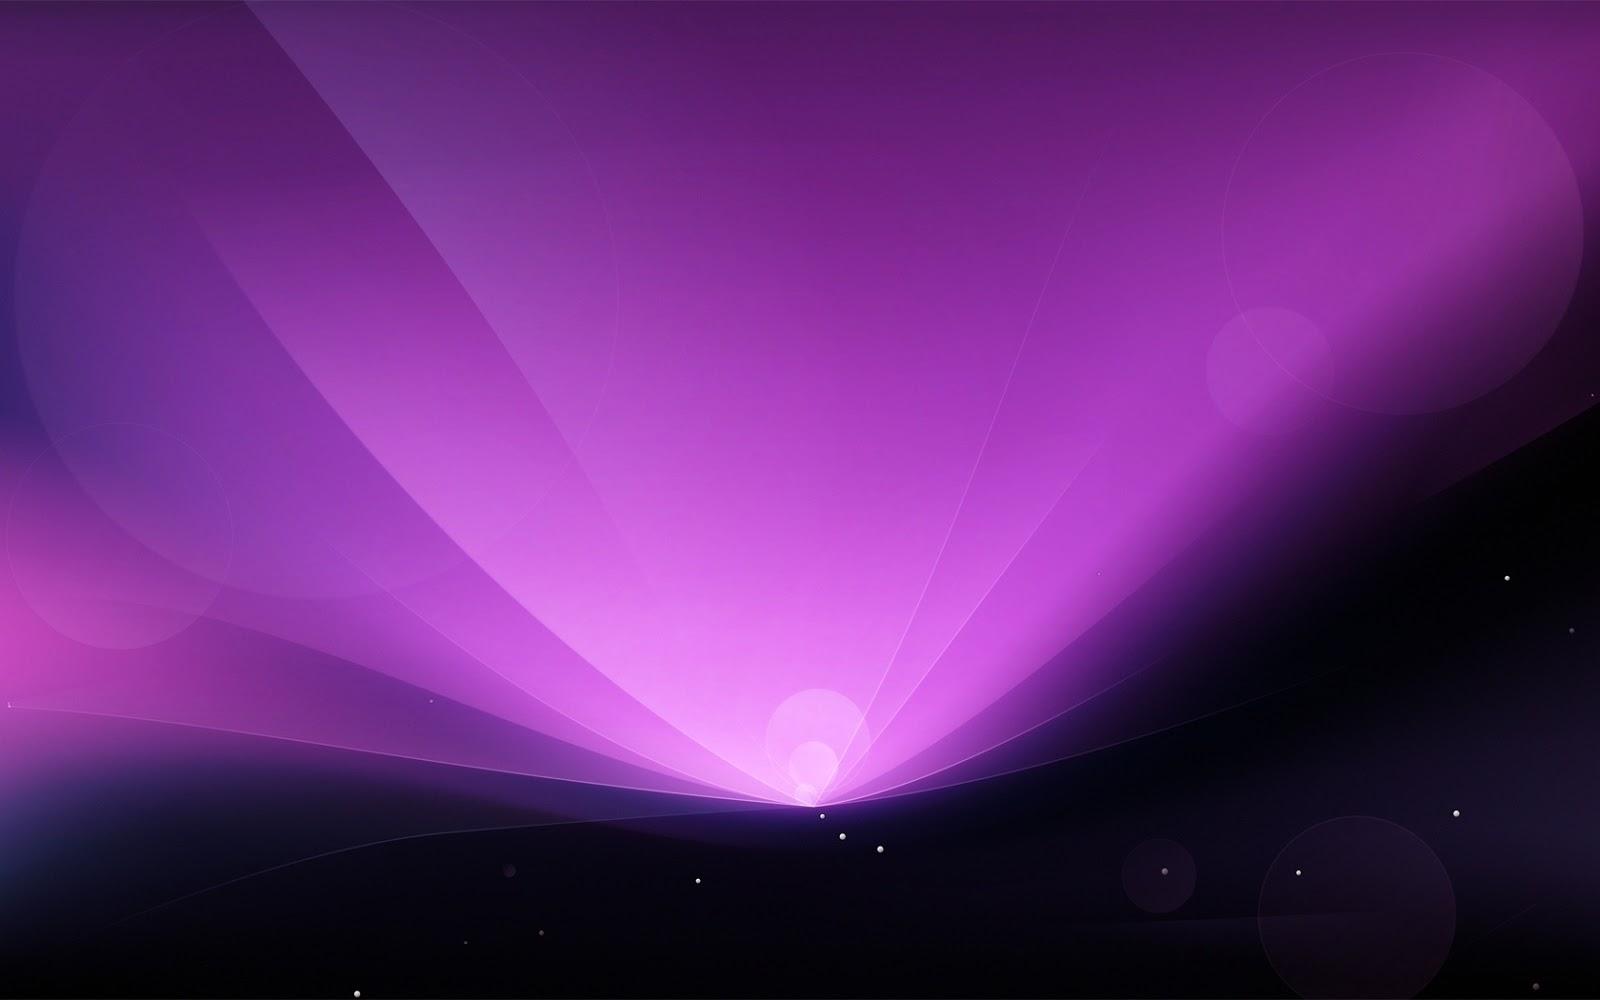 Fondos de pantalla imagenes paisajes wallpapers hd 3d for Mejores fondos de escritorio hd